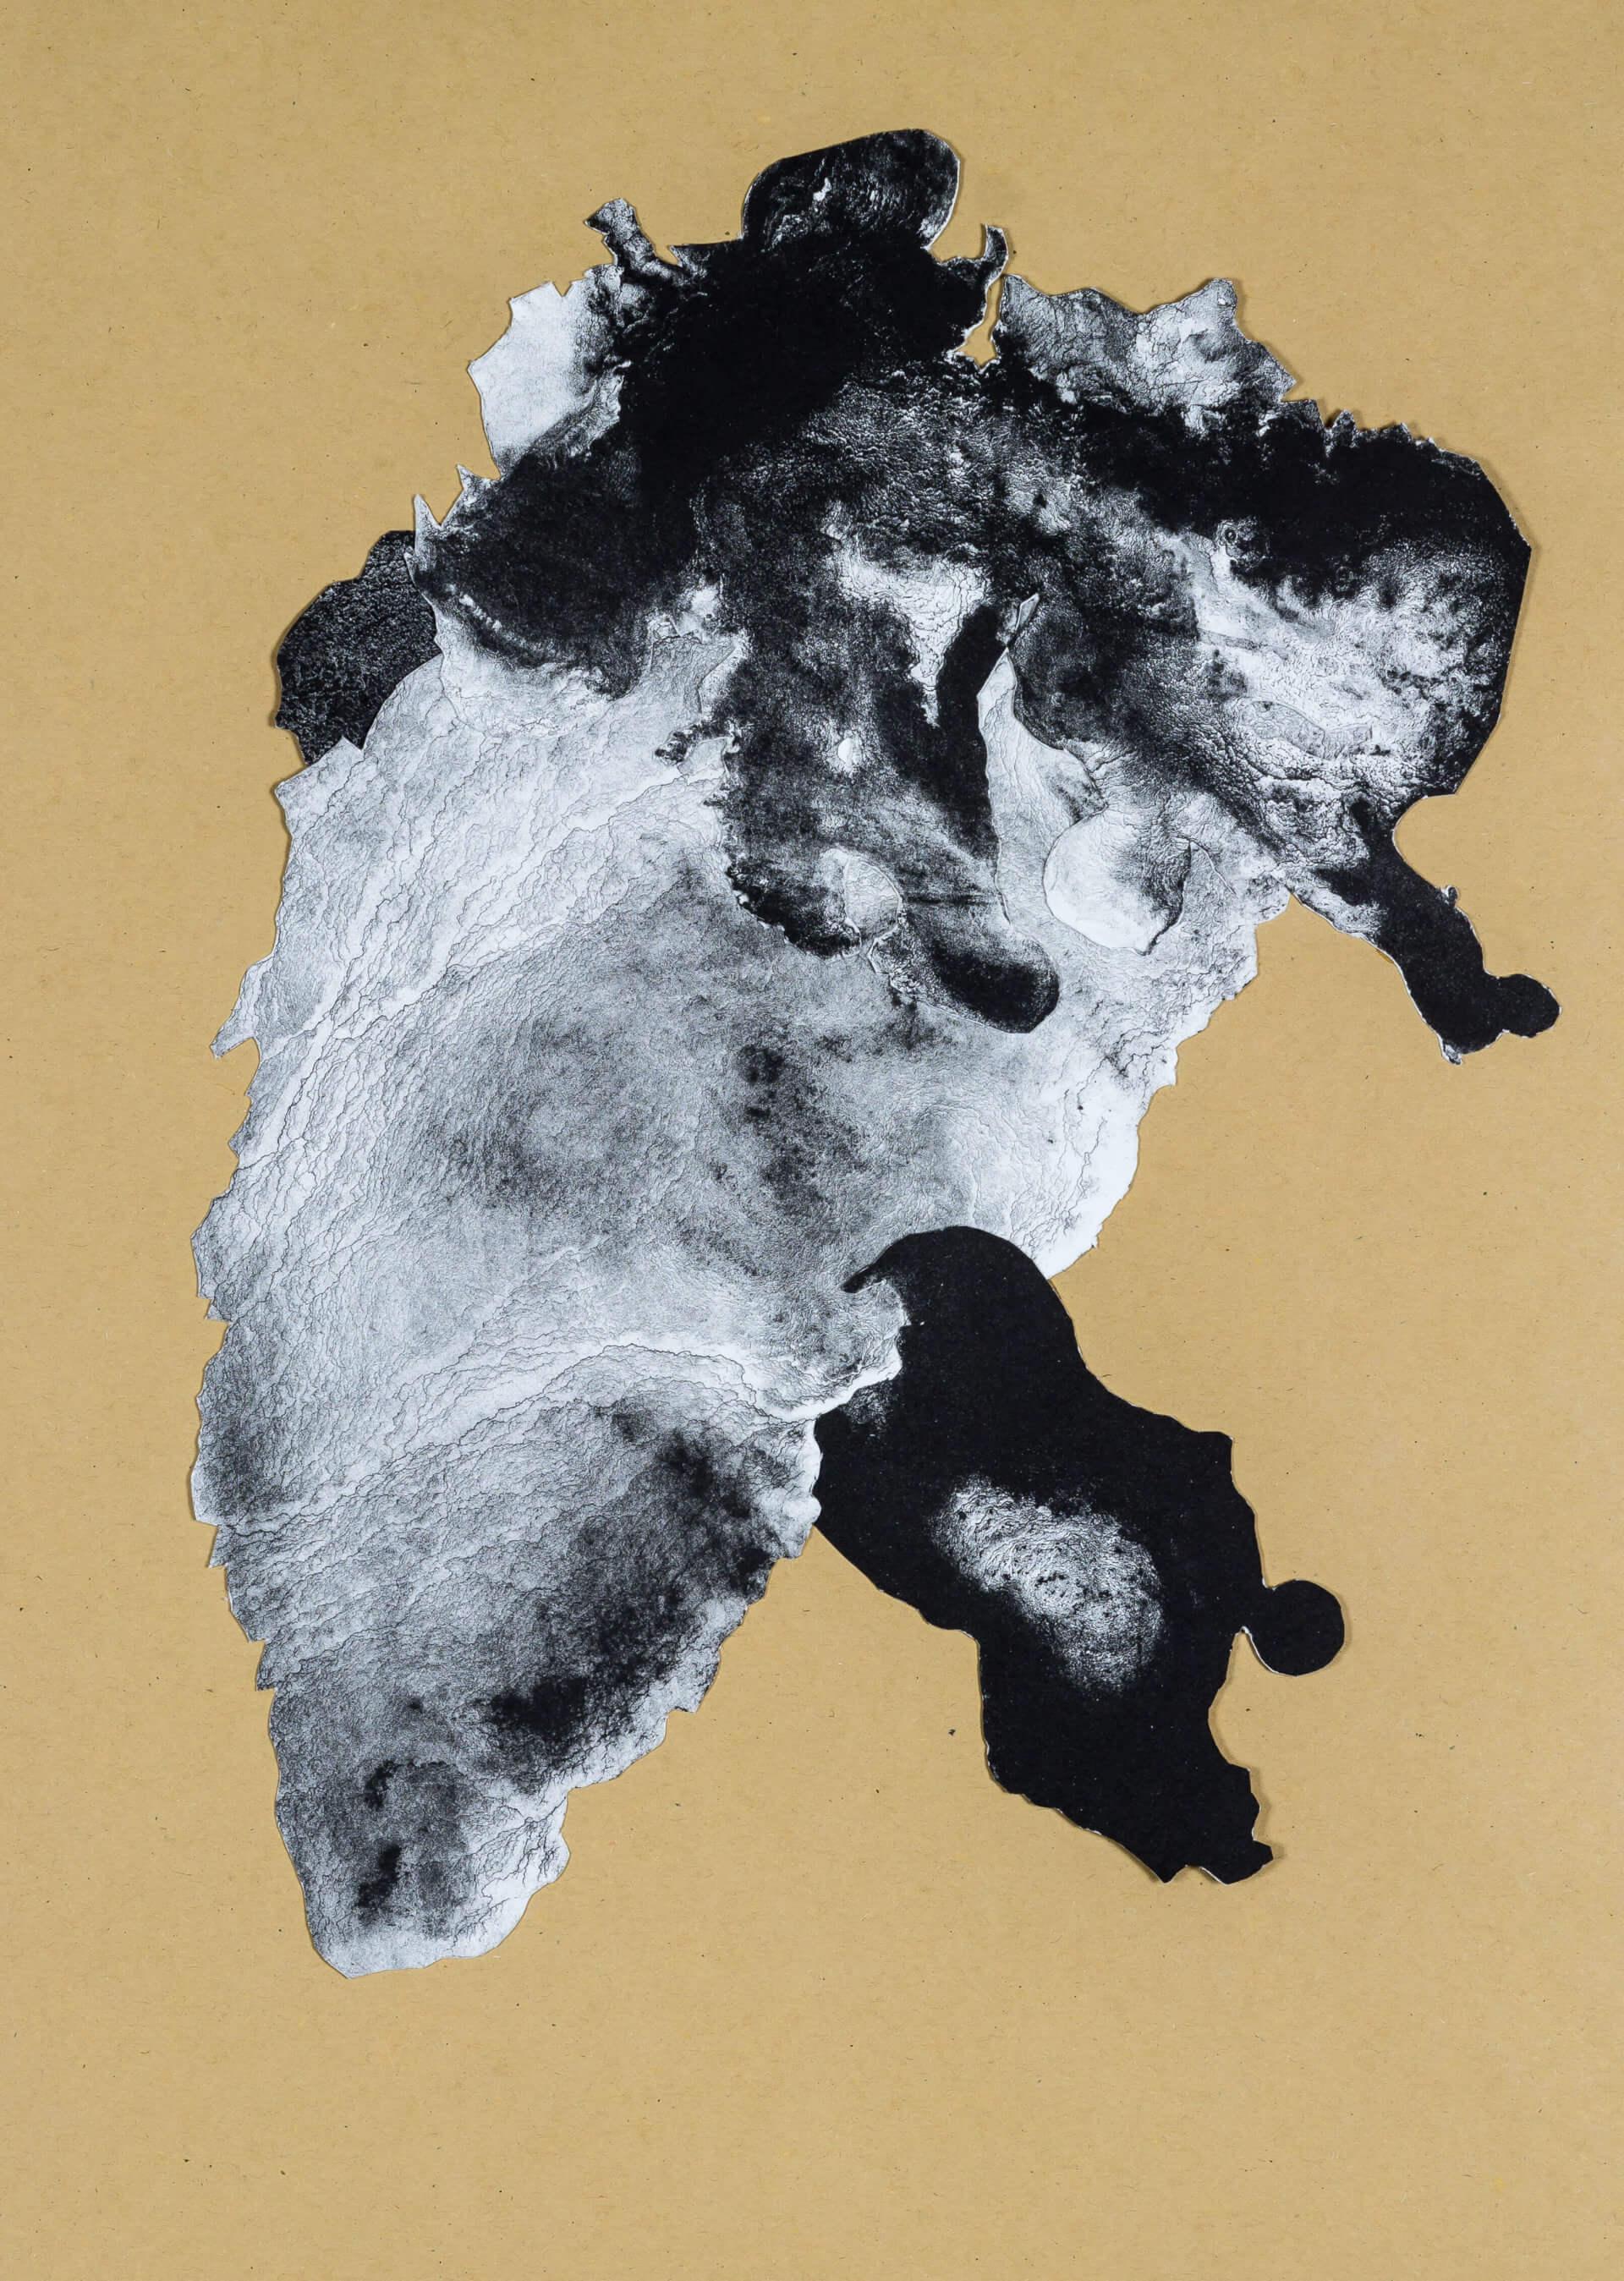 organism (cr) III, 2018, Lithographiecollage auf Papier, Unikat, 41,5x30cm